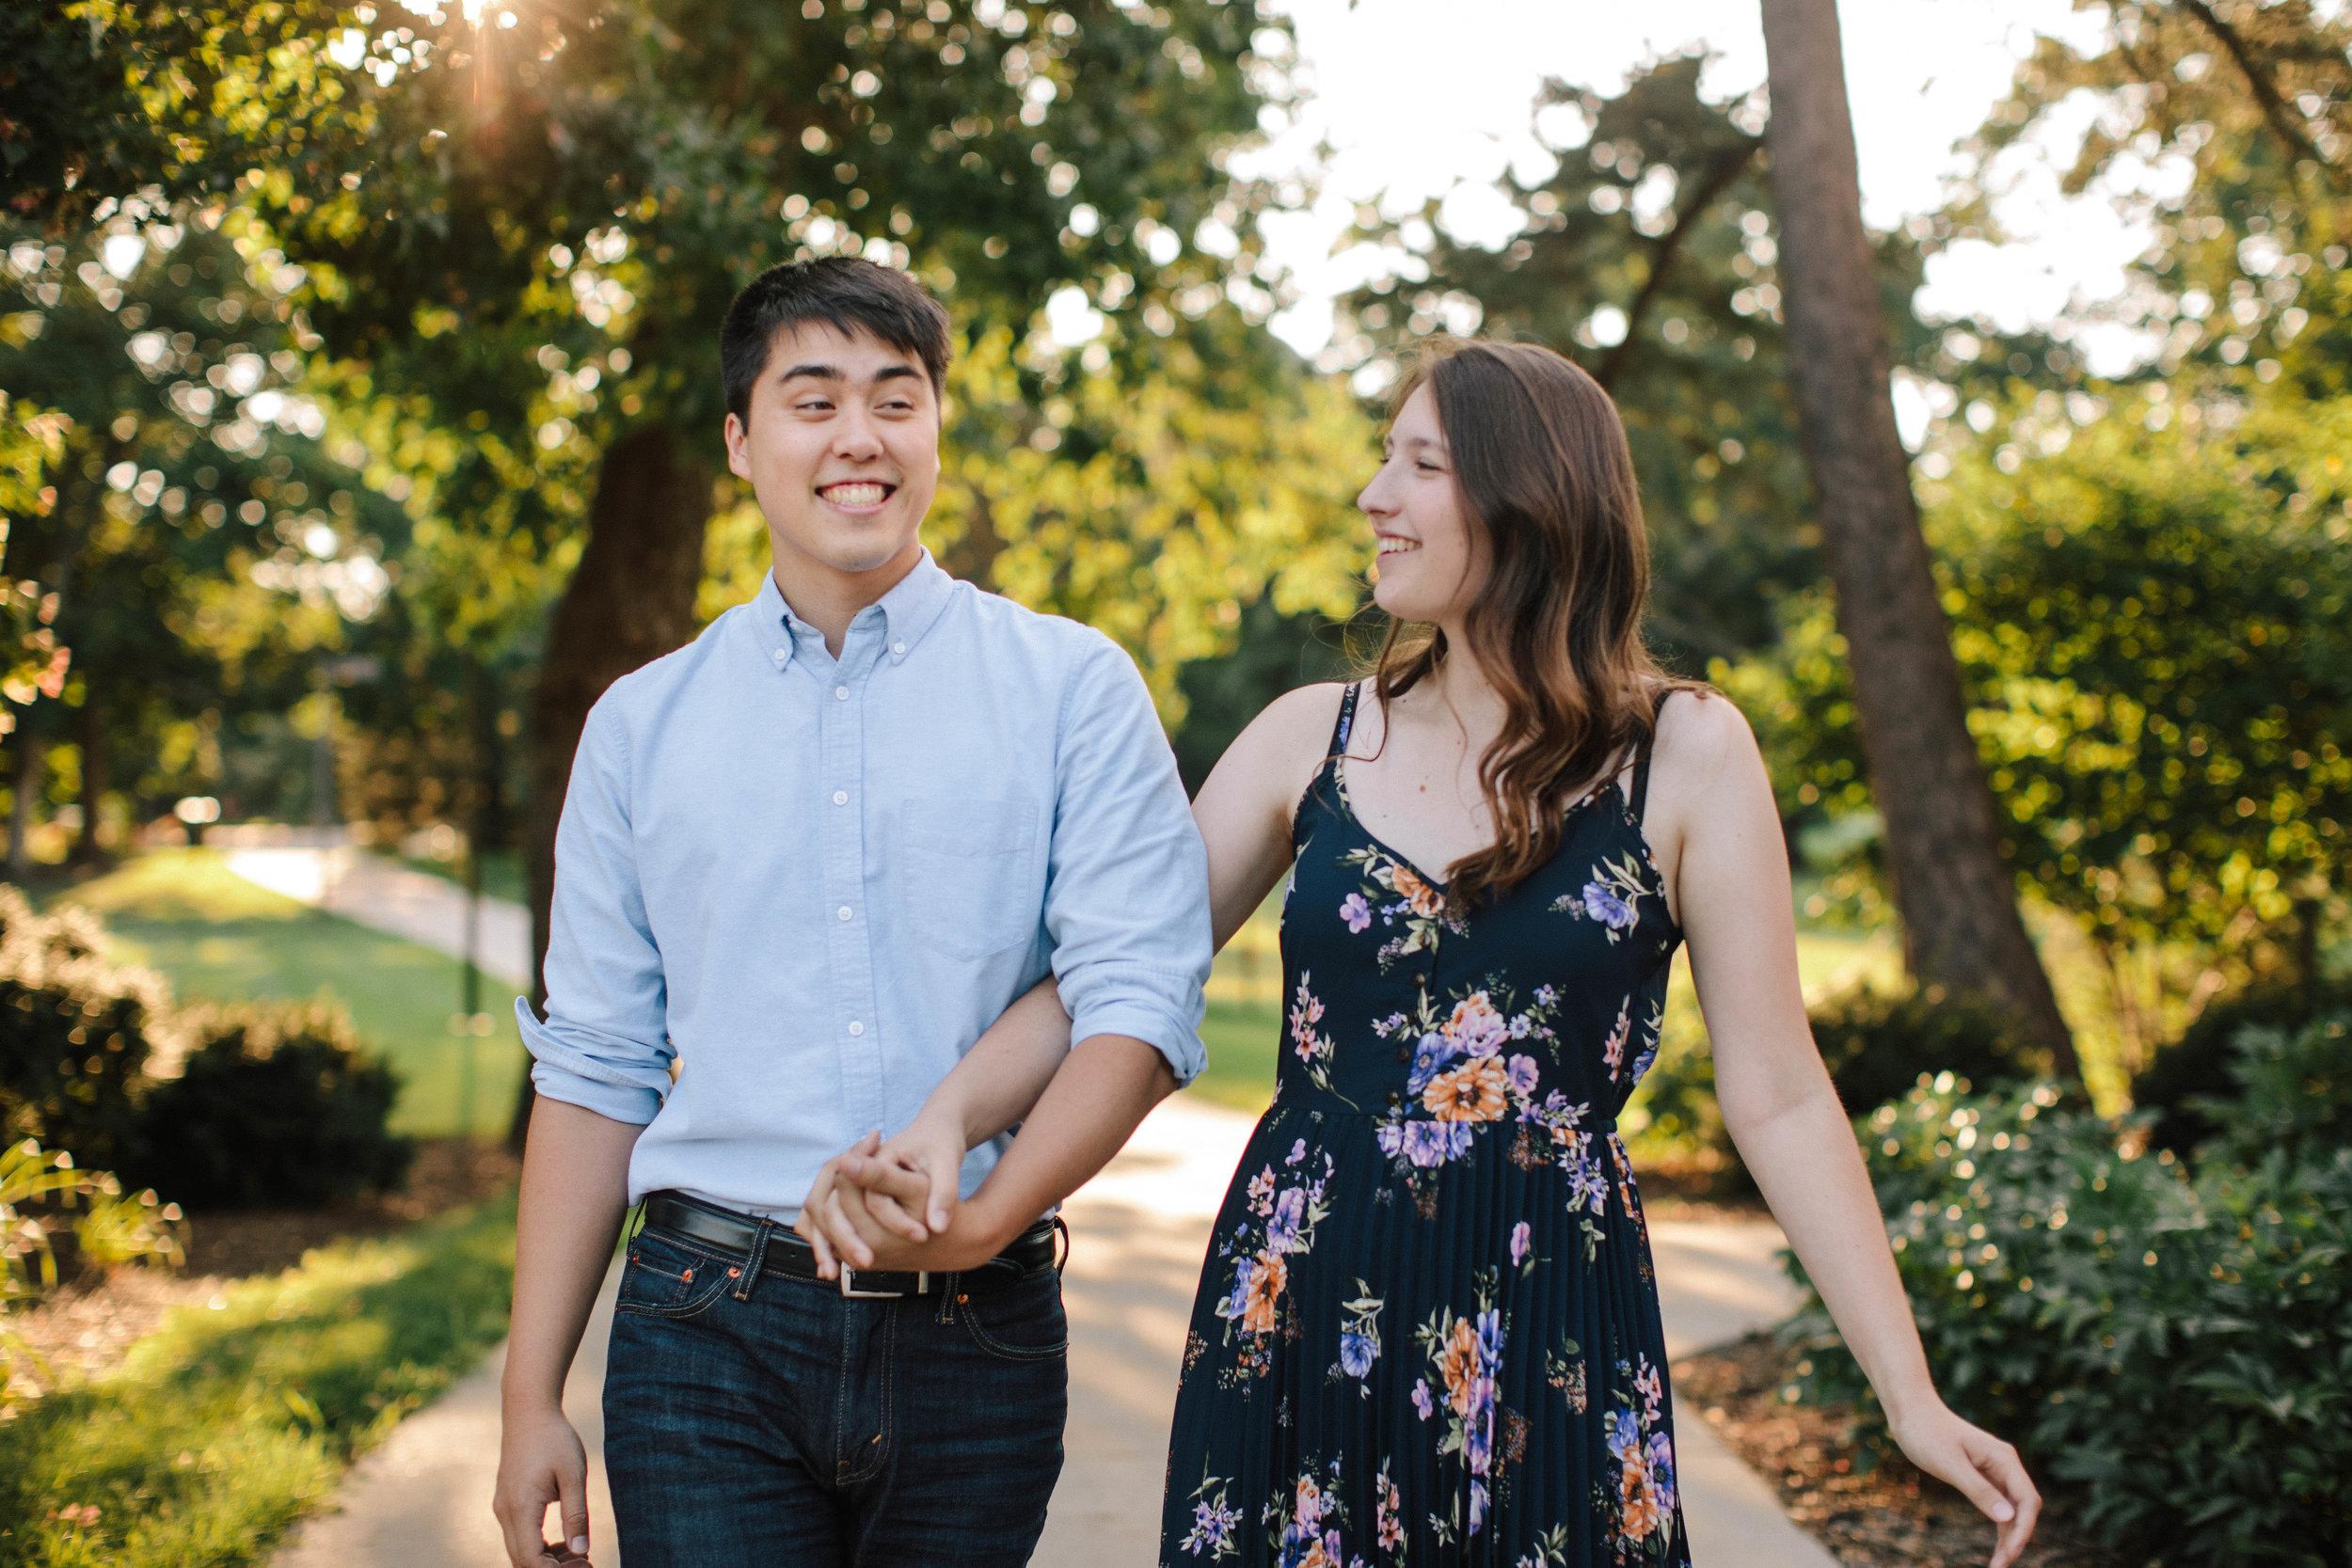 modern and fun wedding photographer in ames Iowa under $3000